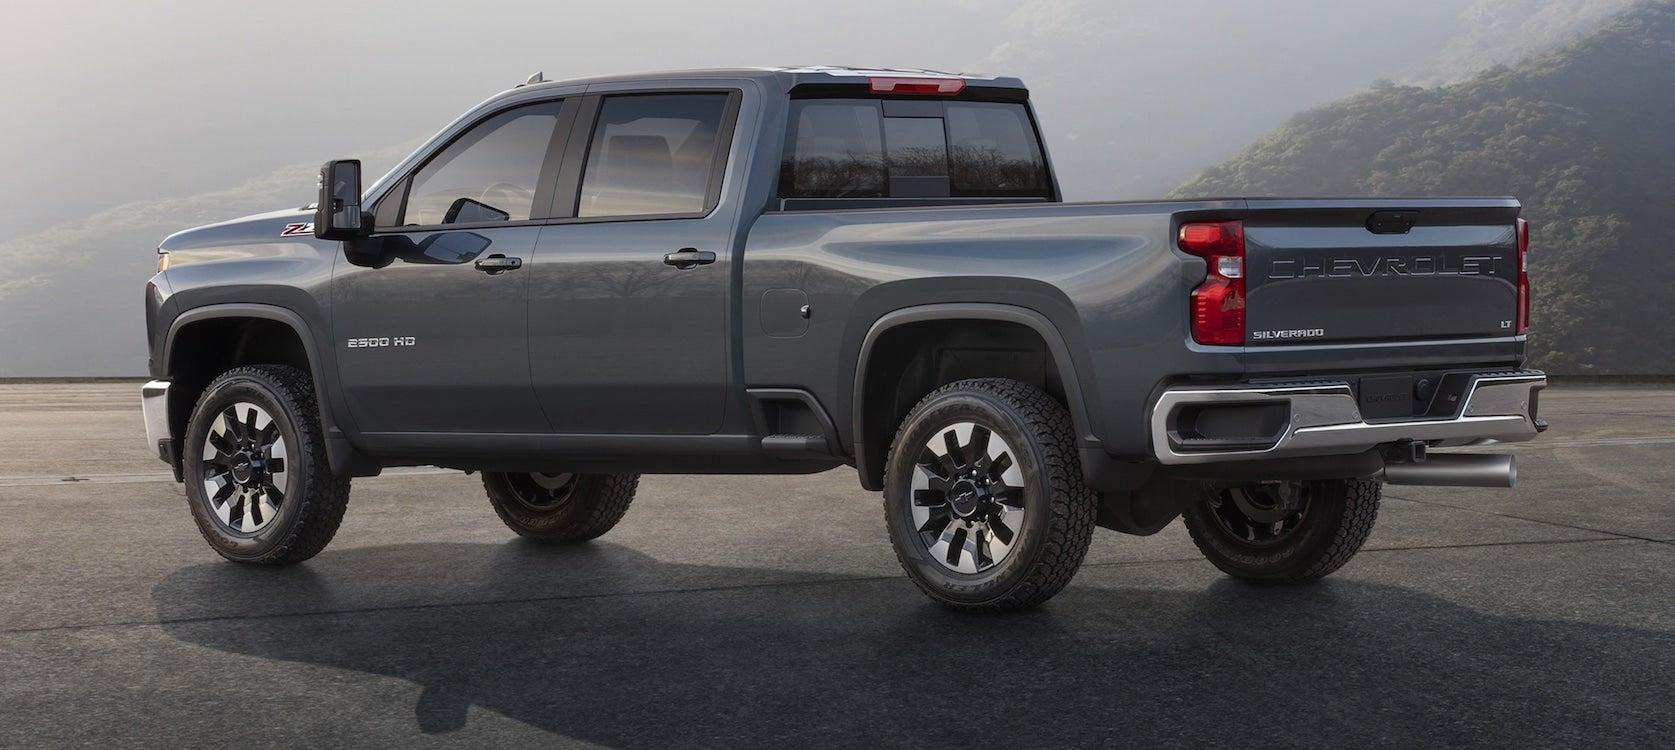 Chevy Rolls Out New Silverado Hd Thedetroitbureau Com